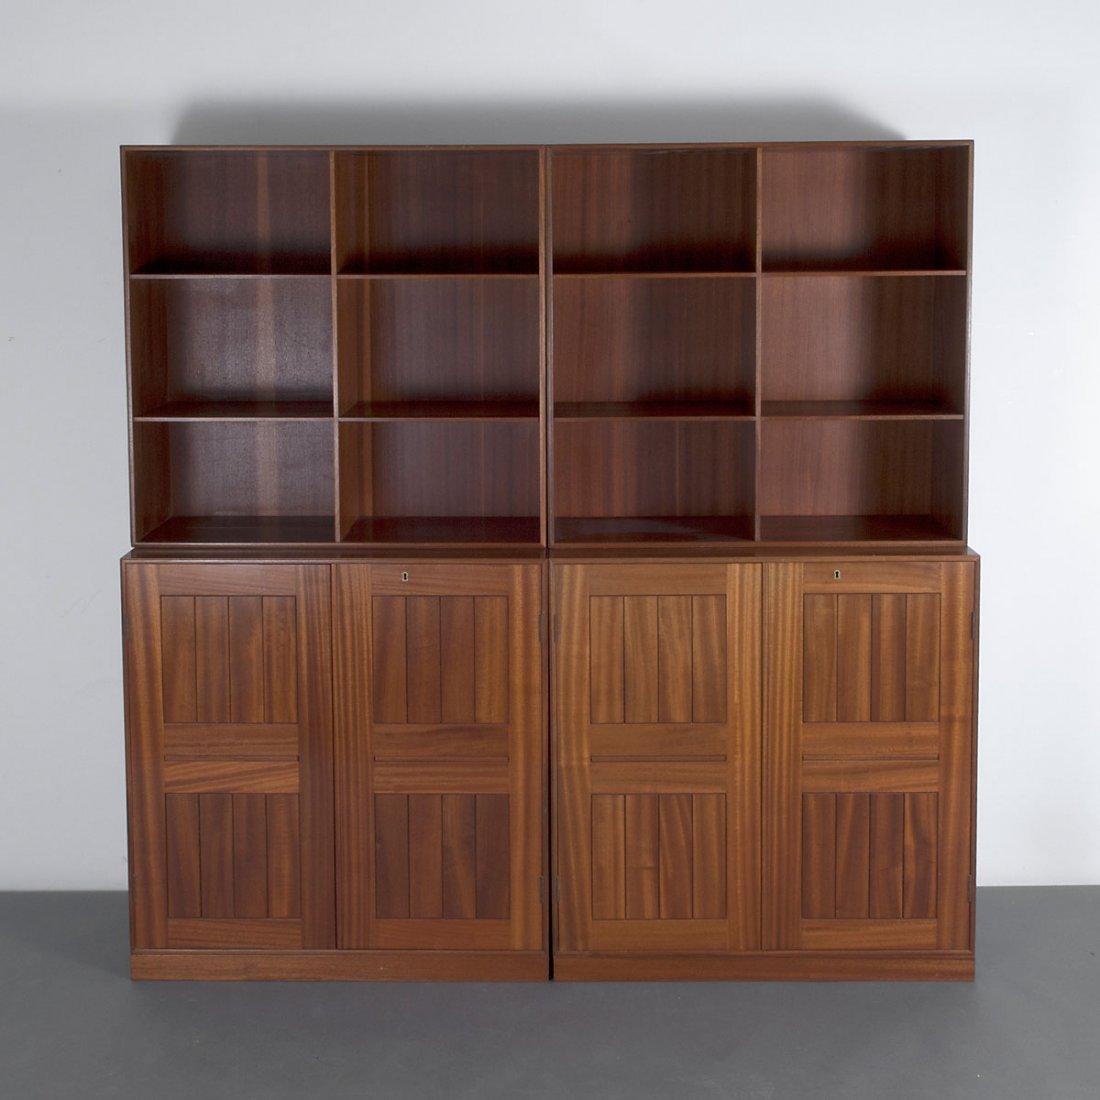 Mogens Koch. Two cabinets with shelves, 1932. Shelves: